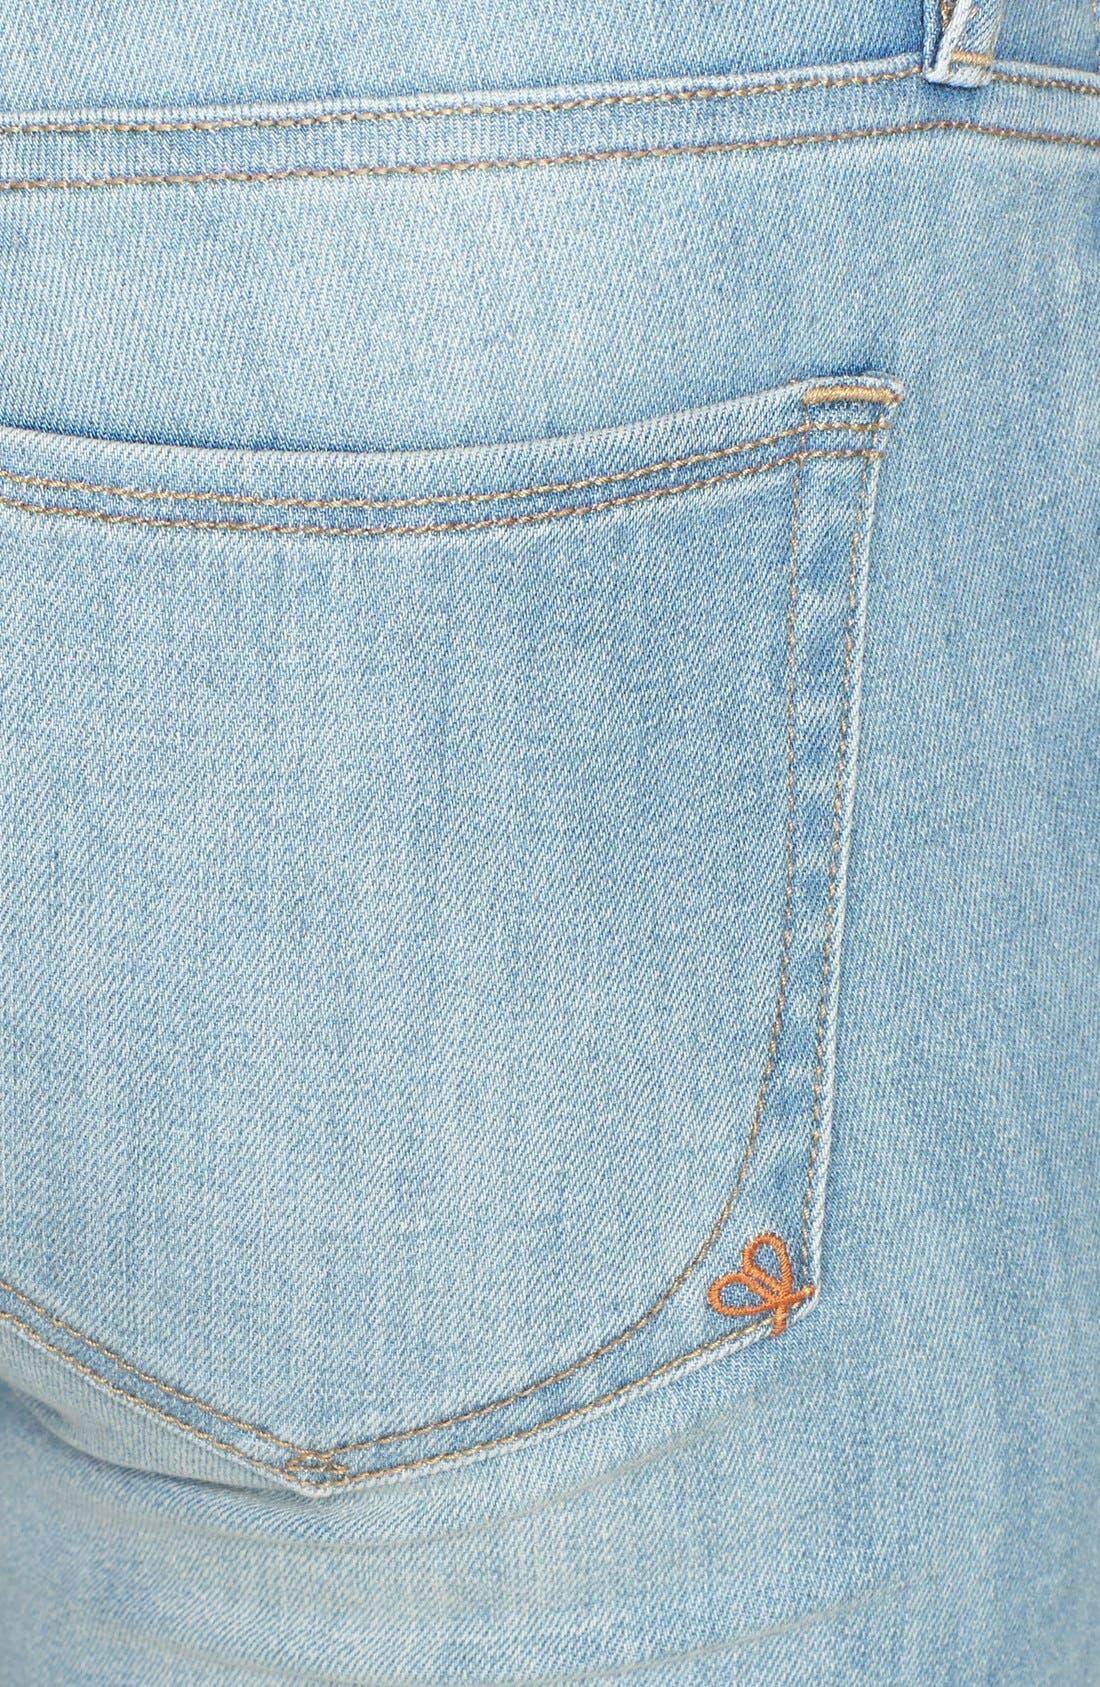 'Stevie' Crop Skinny Jeans,                             Alternate thumbnail 3, color,                             401